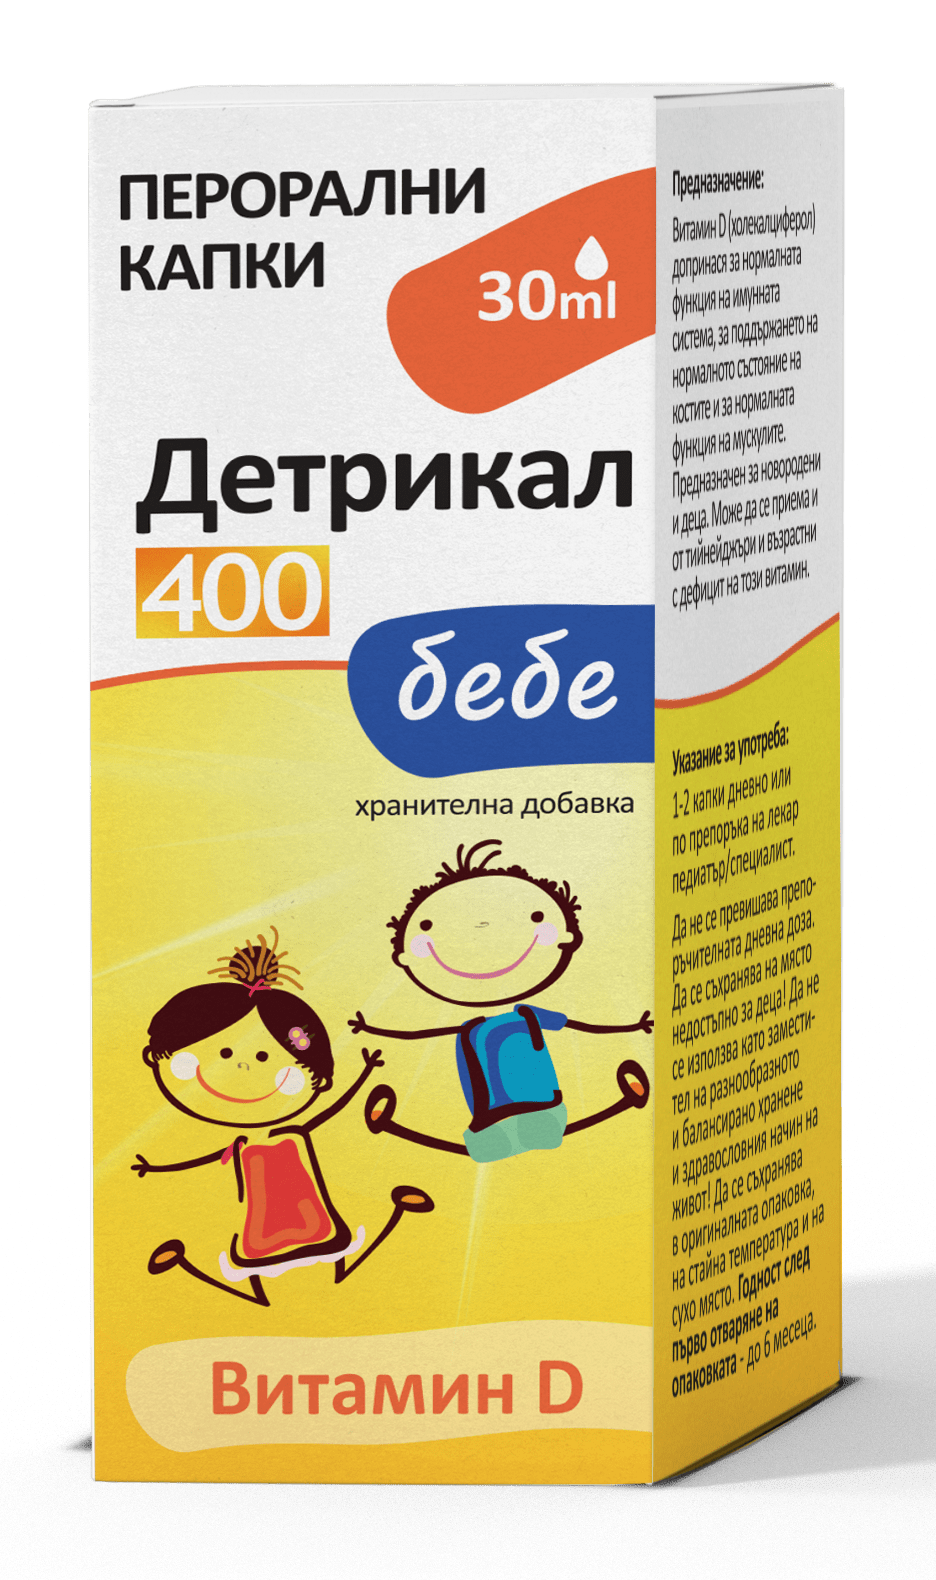 DETRICAL 400 baby drops / ДЕТРИКАЛ 400 бебе, перорални капки